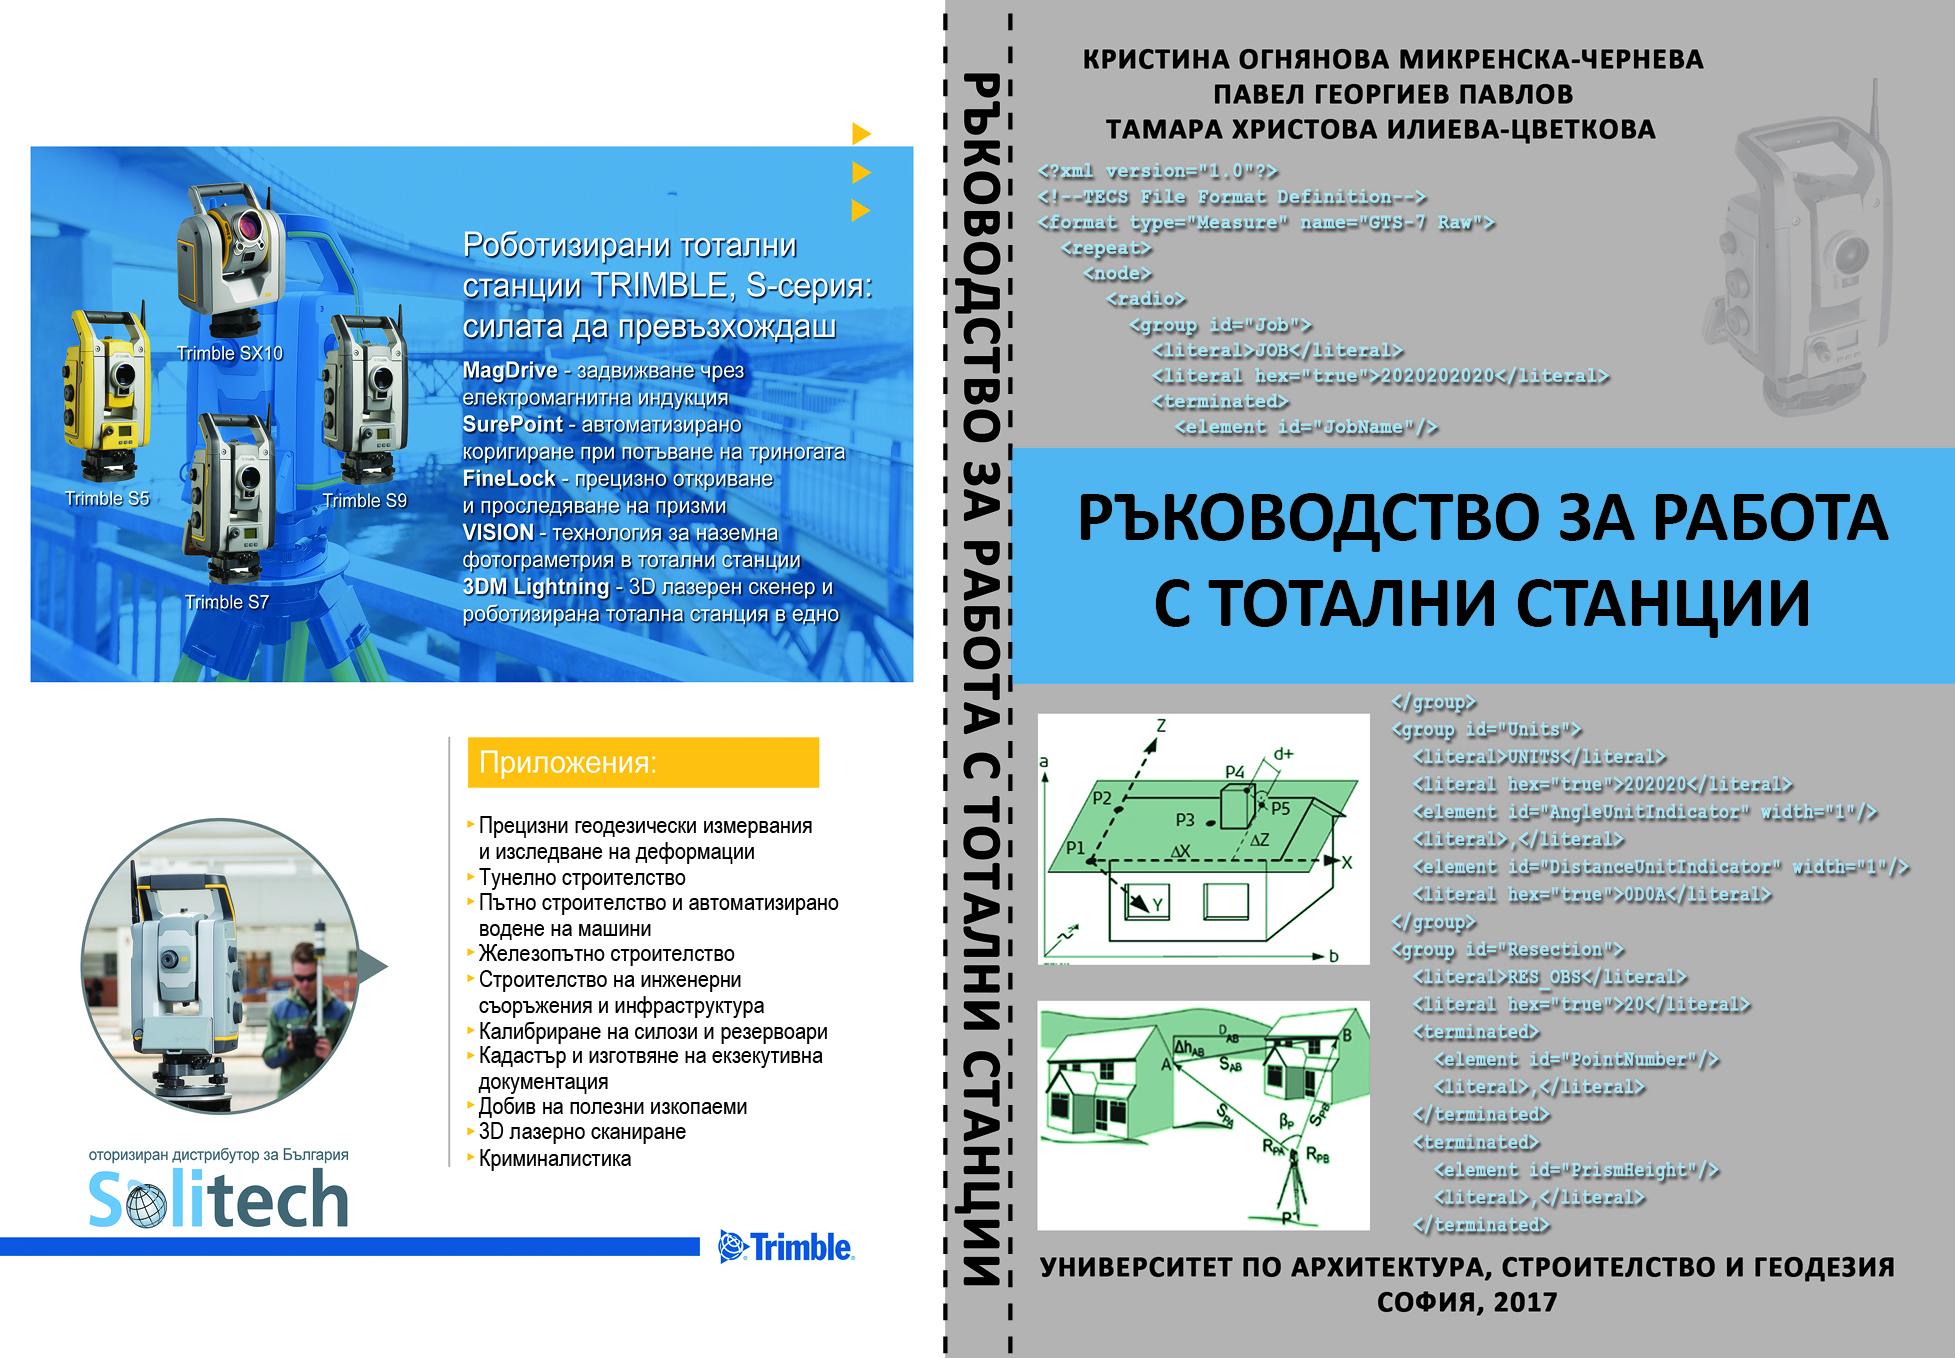 UACEG - Faculties - Faculty of Geodesy - Phone book - Assoc  Prof